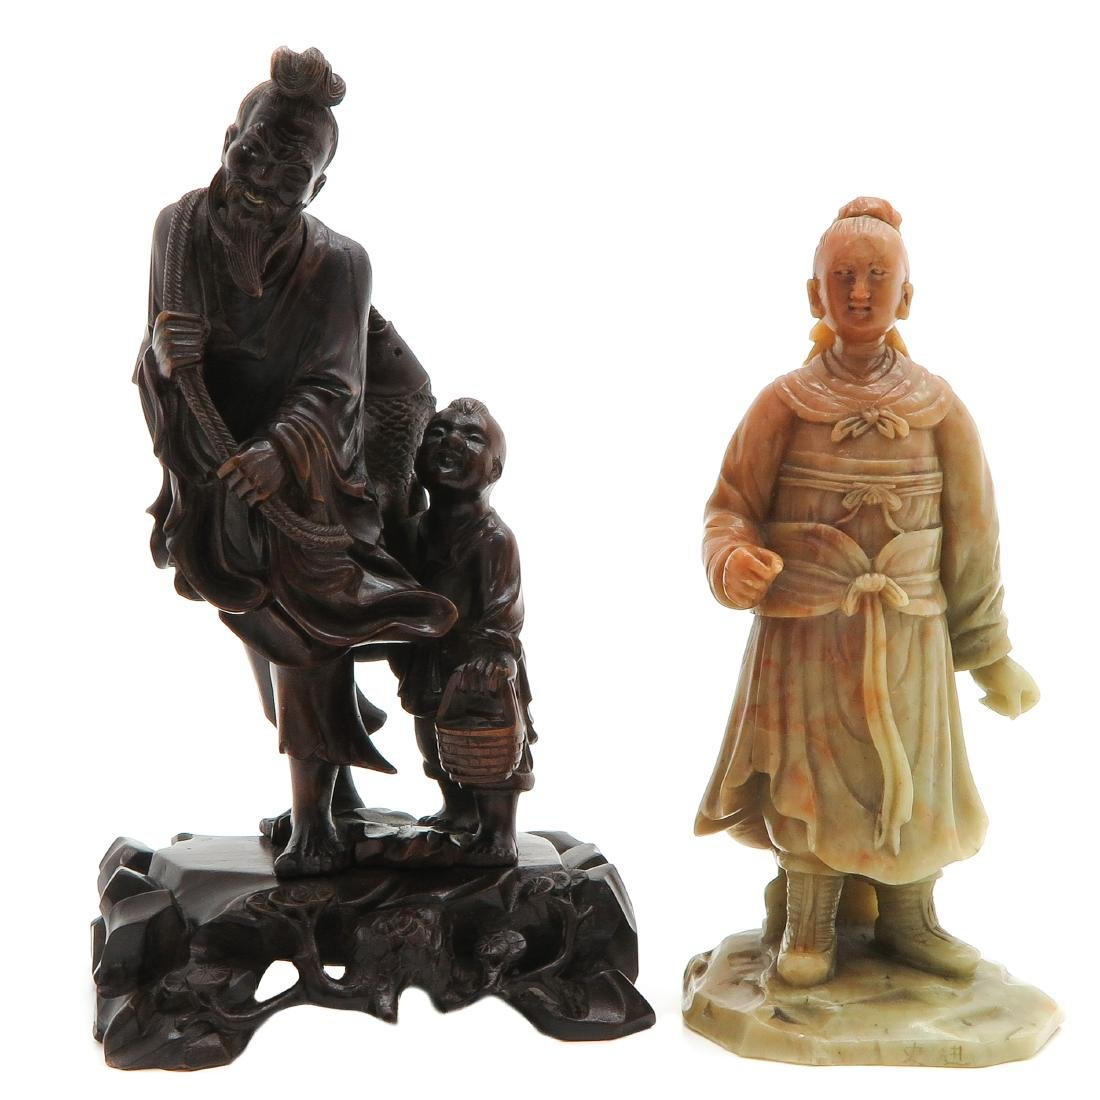 Lot of 2 Sculptures